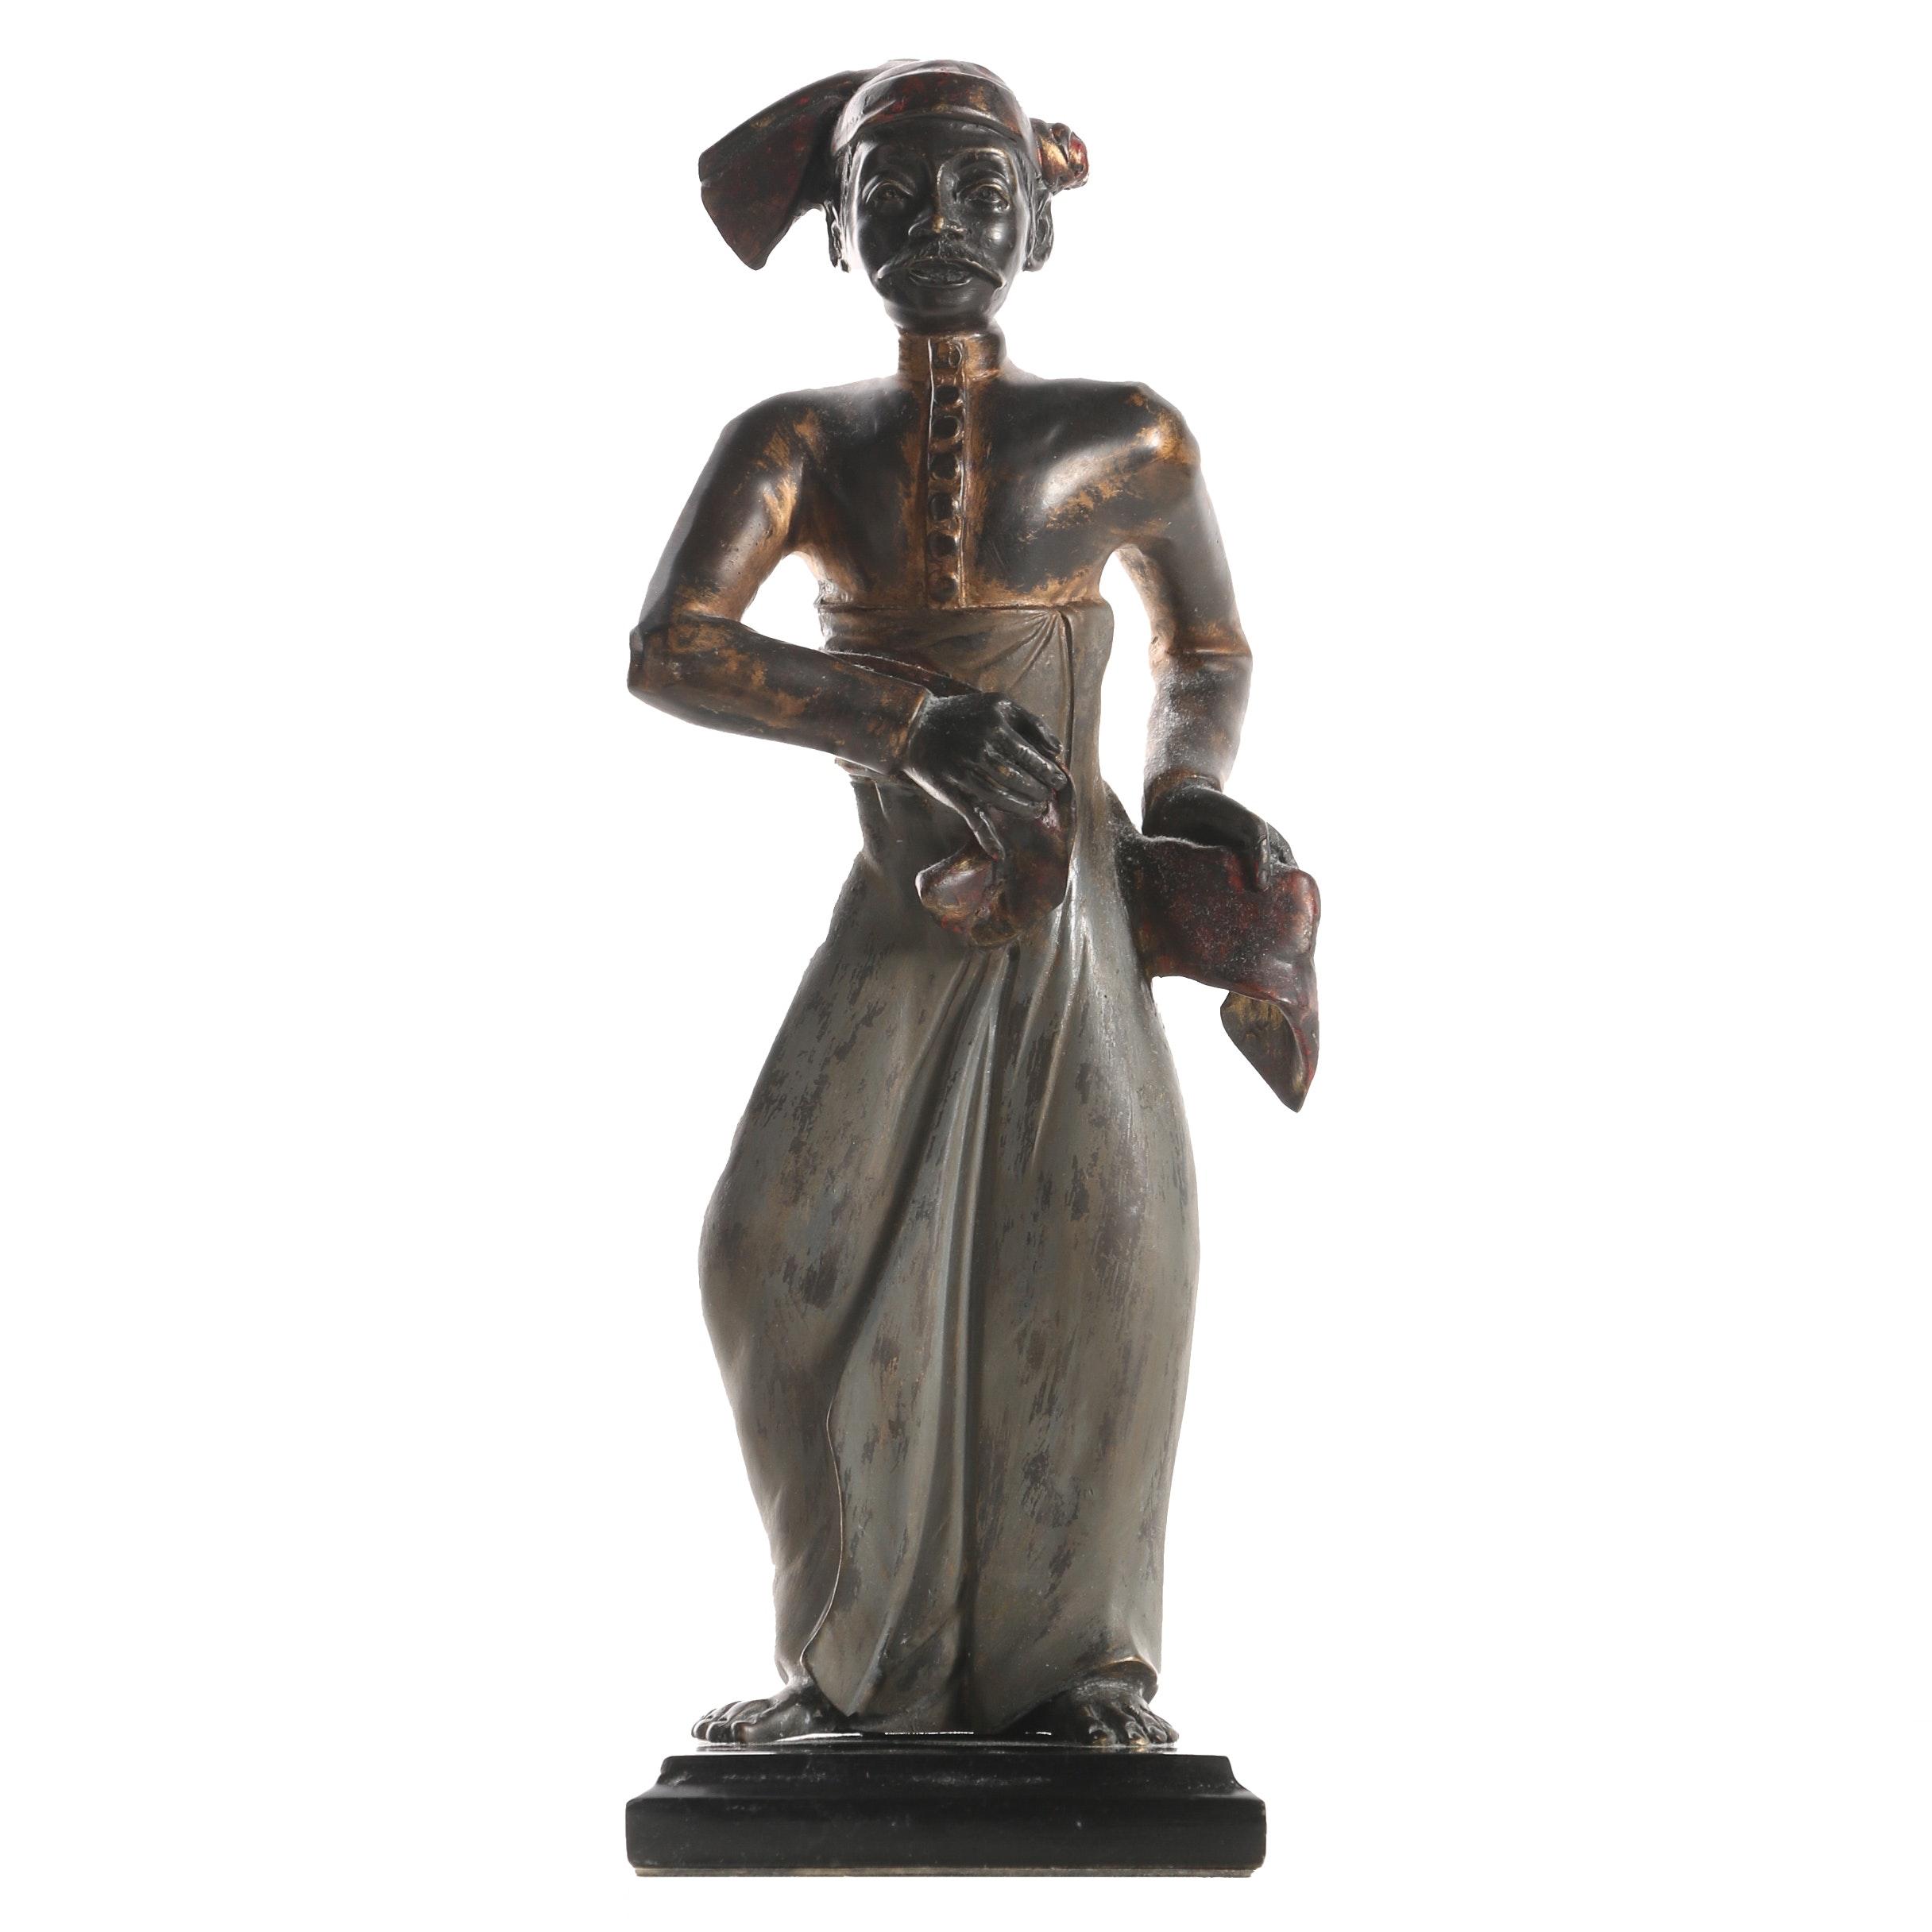 Brass Sculpture of Indonesian Style Figure